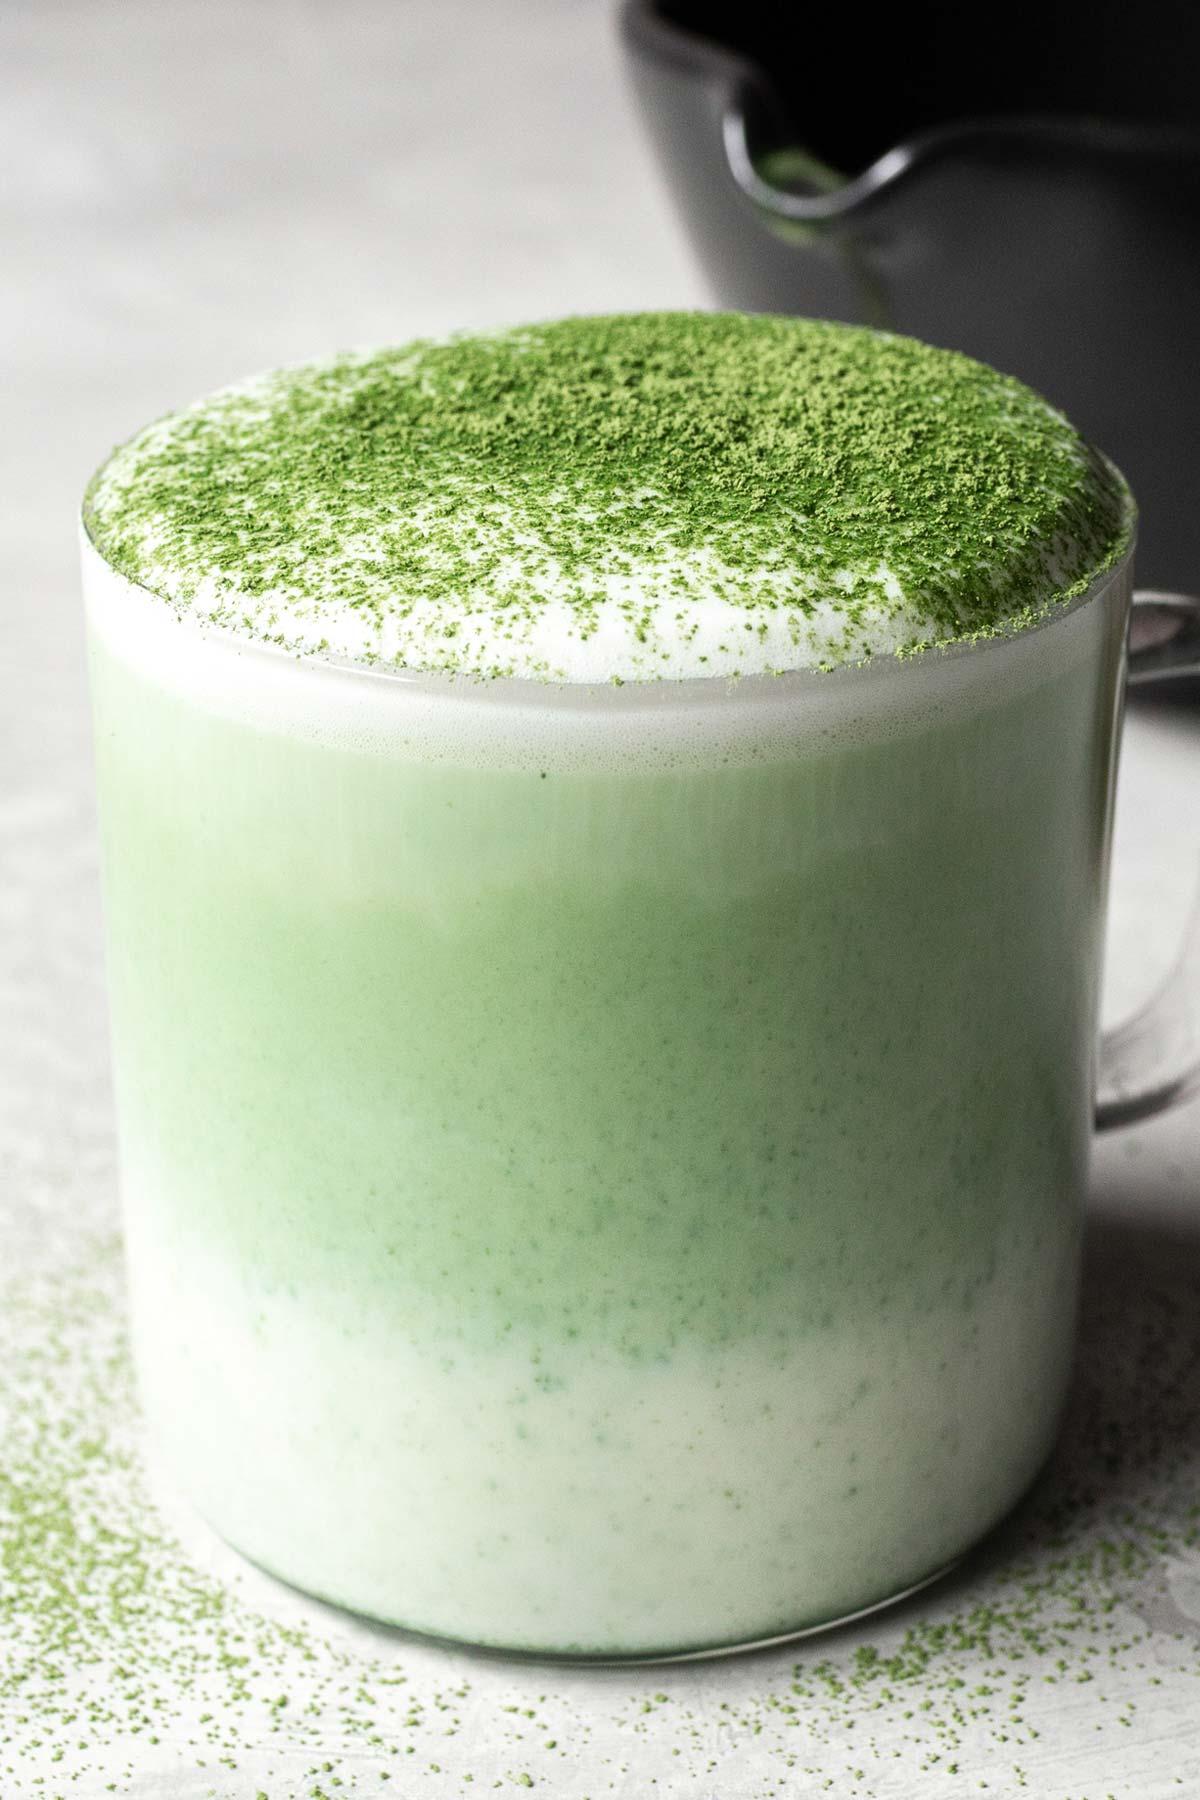 Matcha green tea in a glass mug.